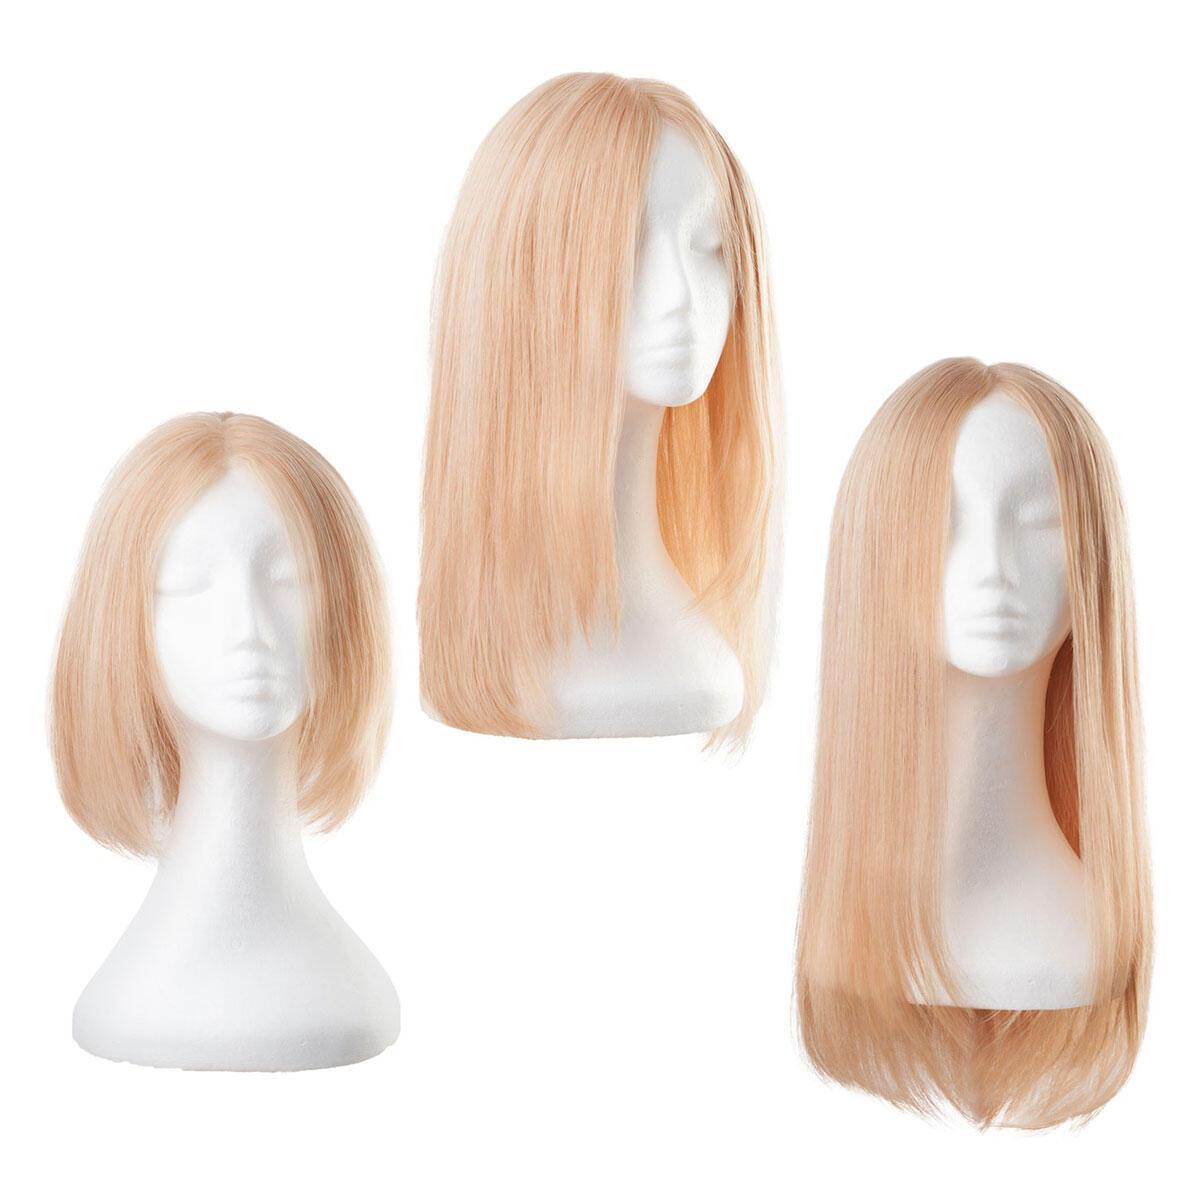 Lace Perücke Echthaar 7.5 Dark Blonde 30 cm